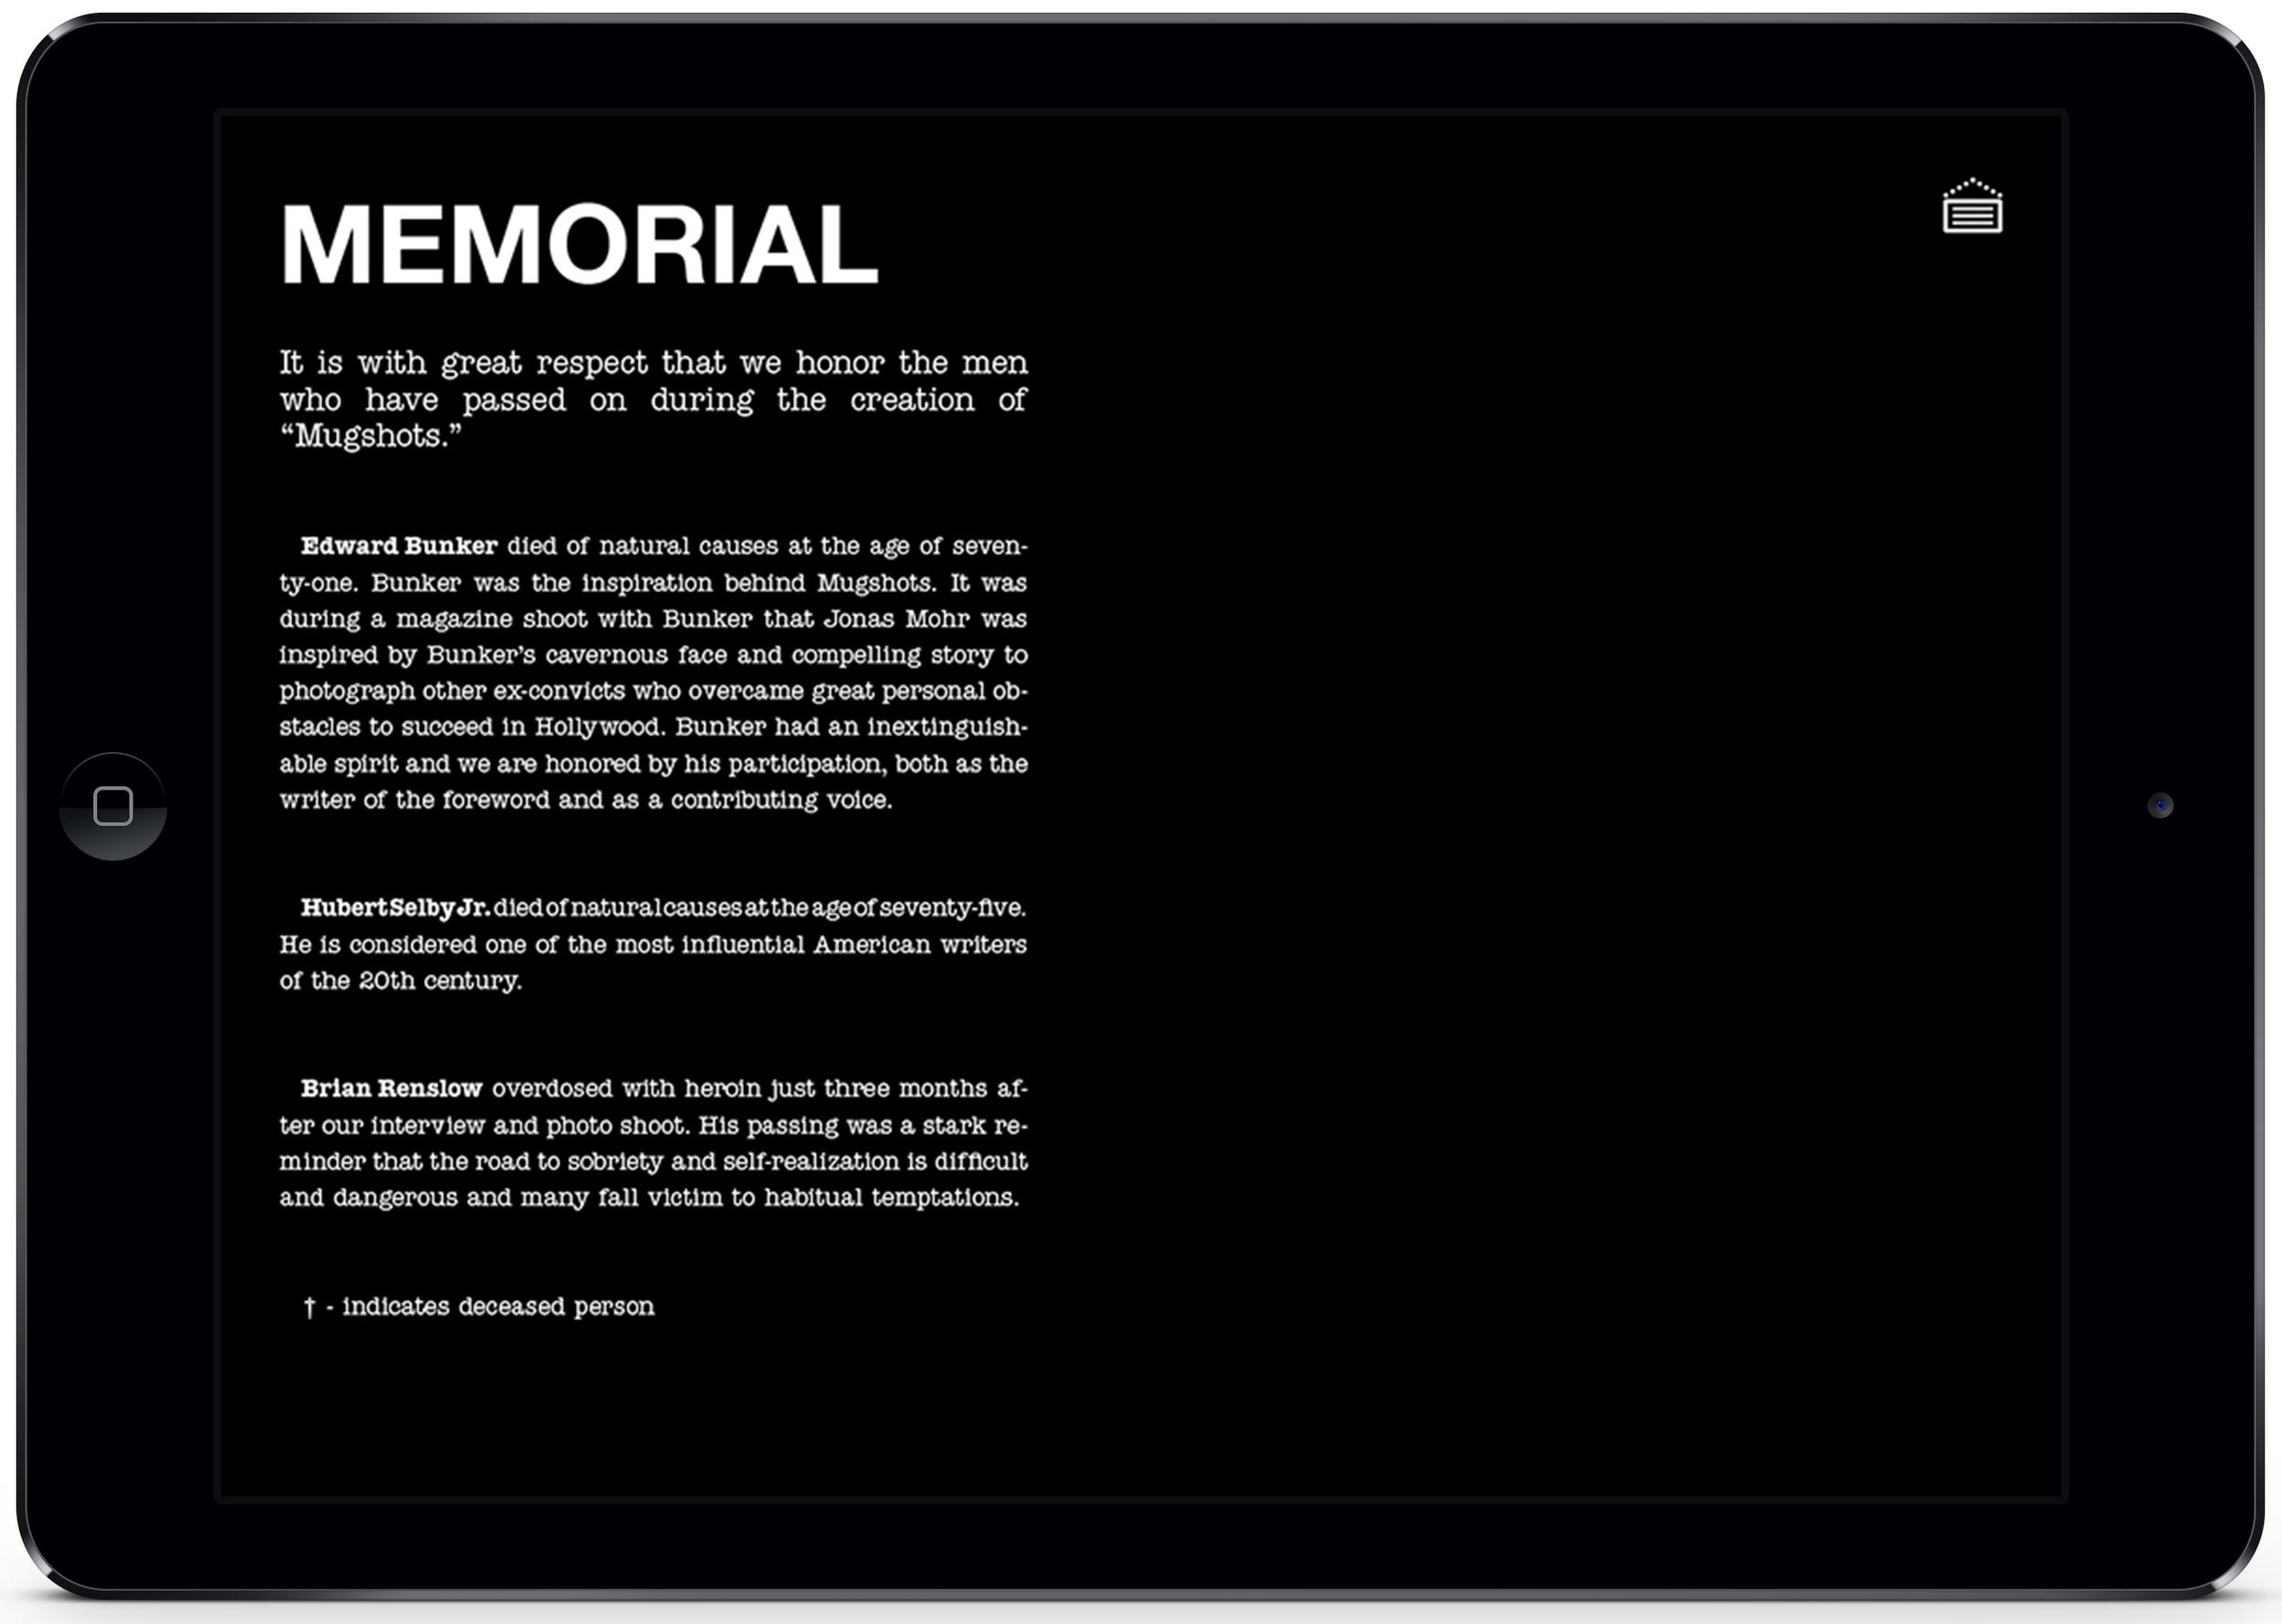 memorial mock up.jpg